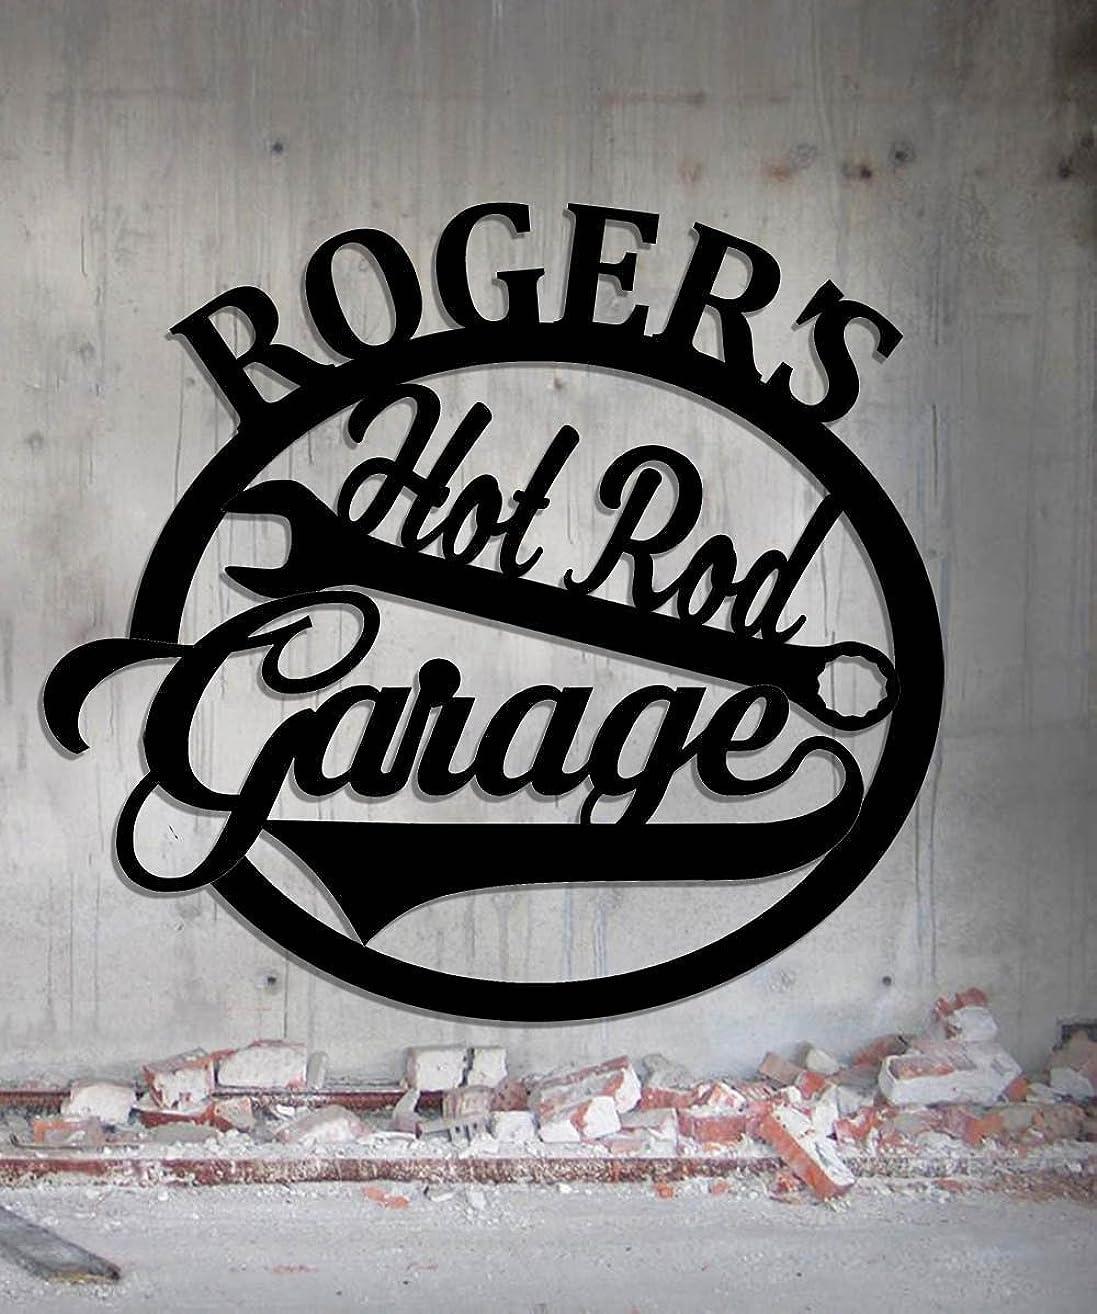 Hot Rod Garage - Personalized Workshop Sign - Metal Wall Art- Customize It!- Metal Wall Art Man Cave Grandpa's Dad's Or Custom Name